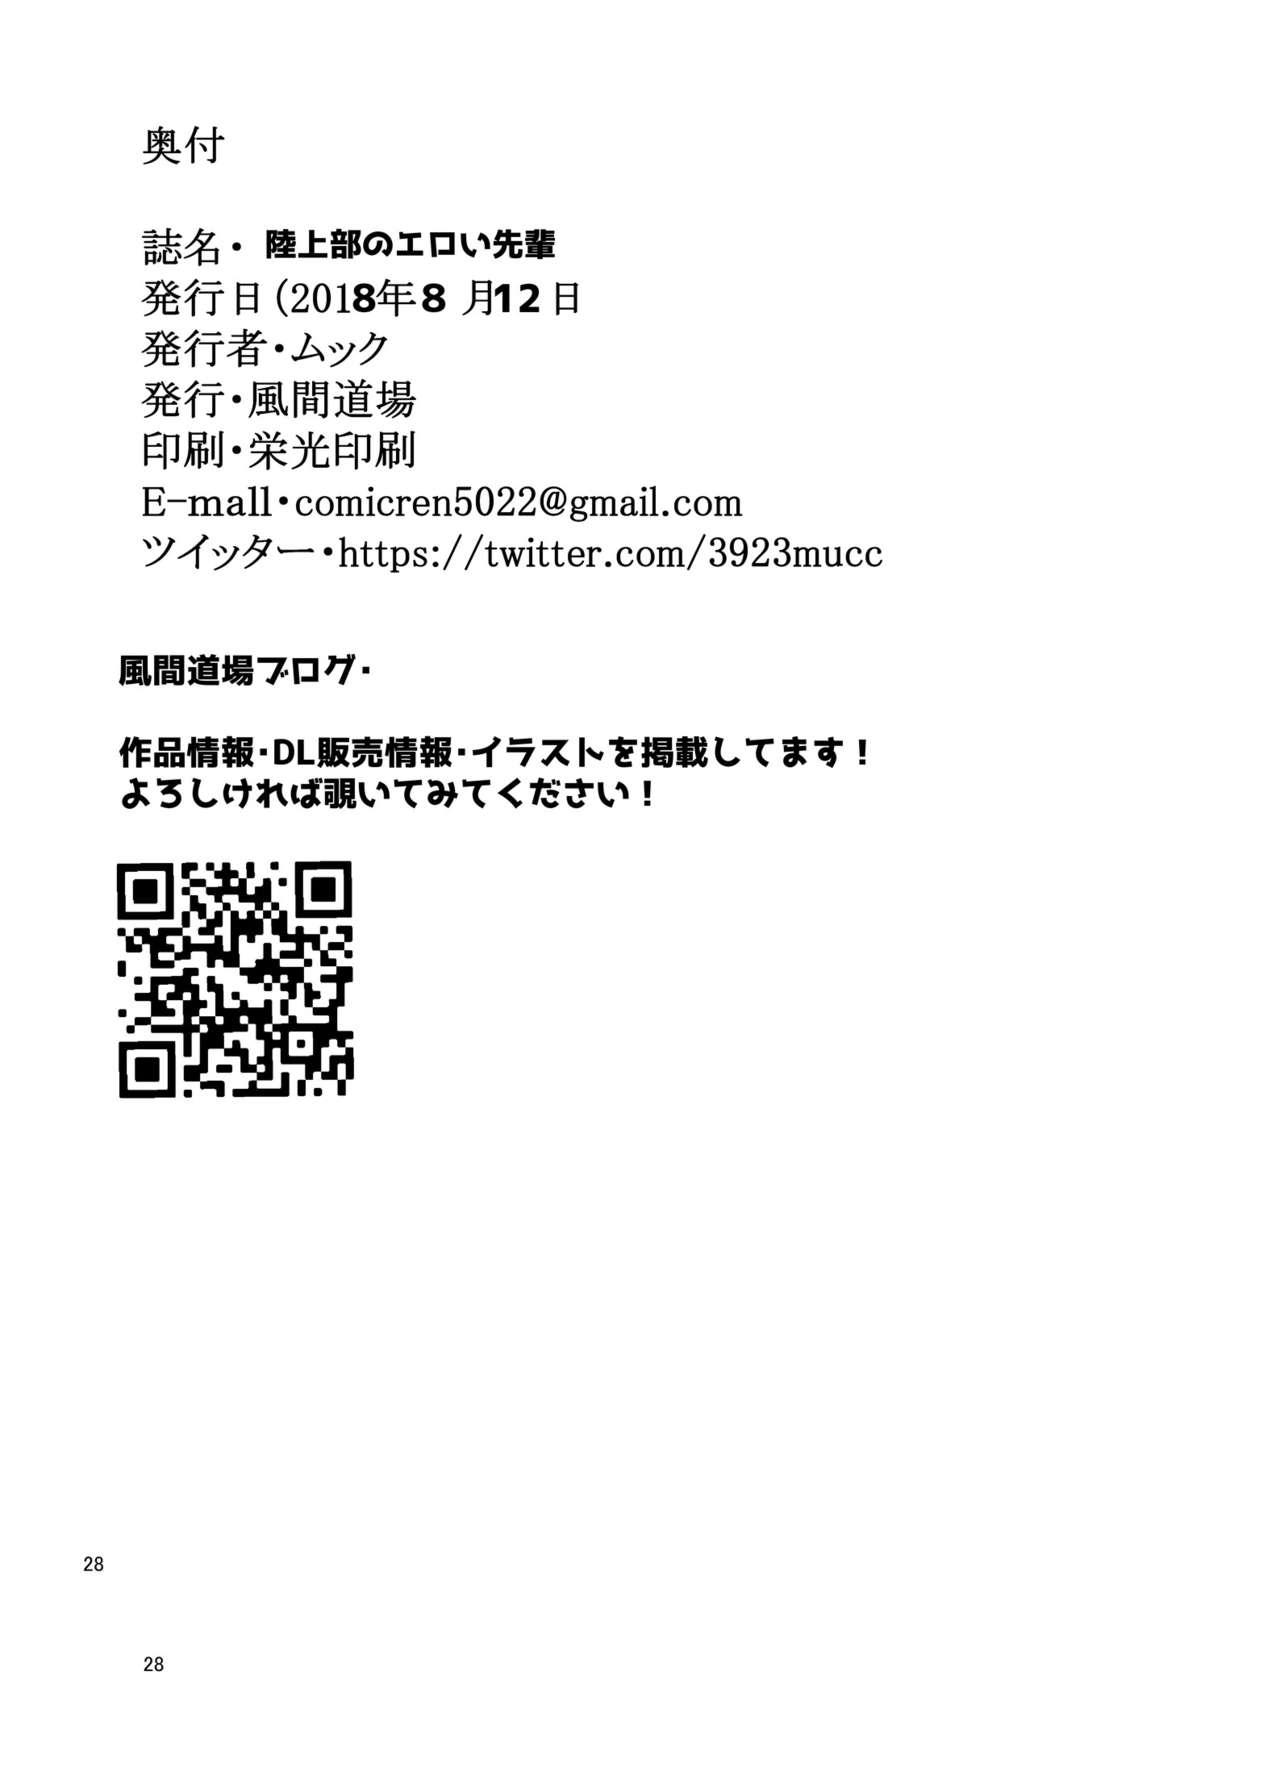 Rikujoubu no Eroi Senpai 26